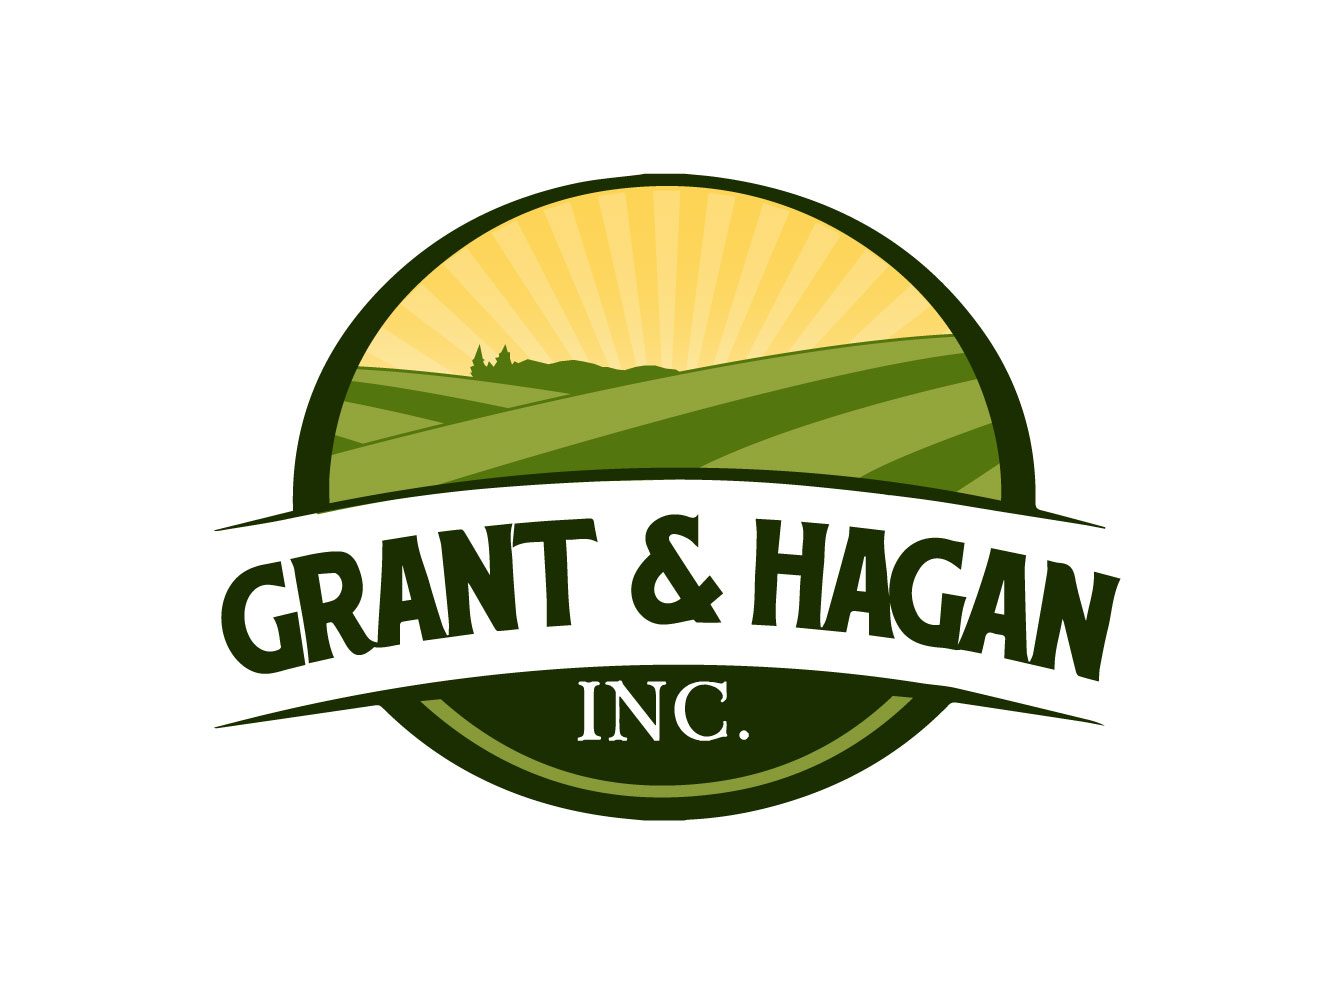 http://mvjrgolf.com/wp-content/uploads/2017/02/Grant-Hagan.jpg